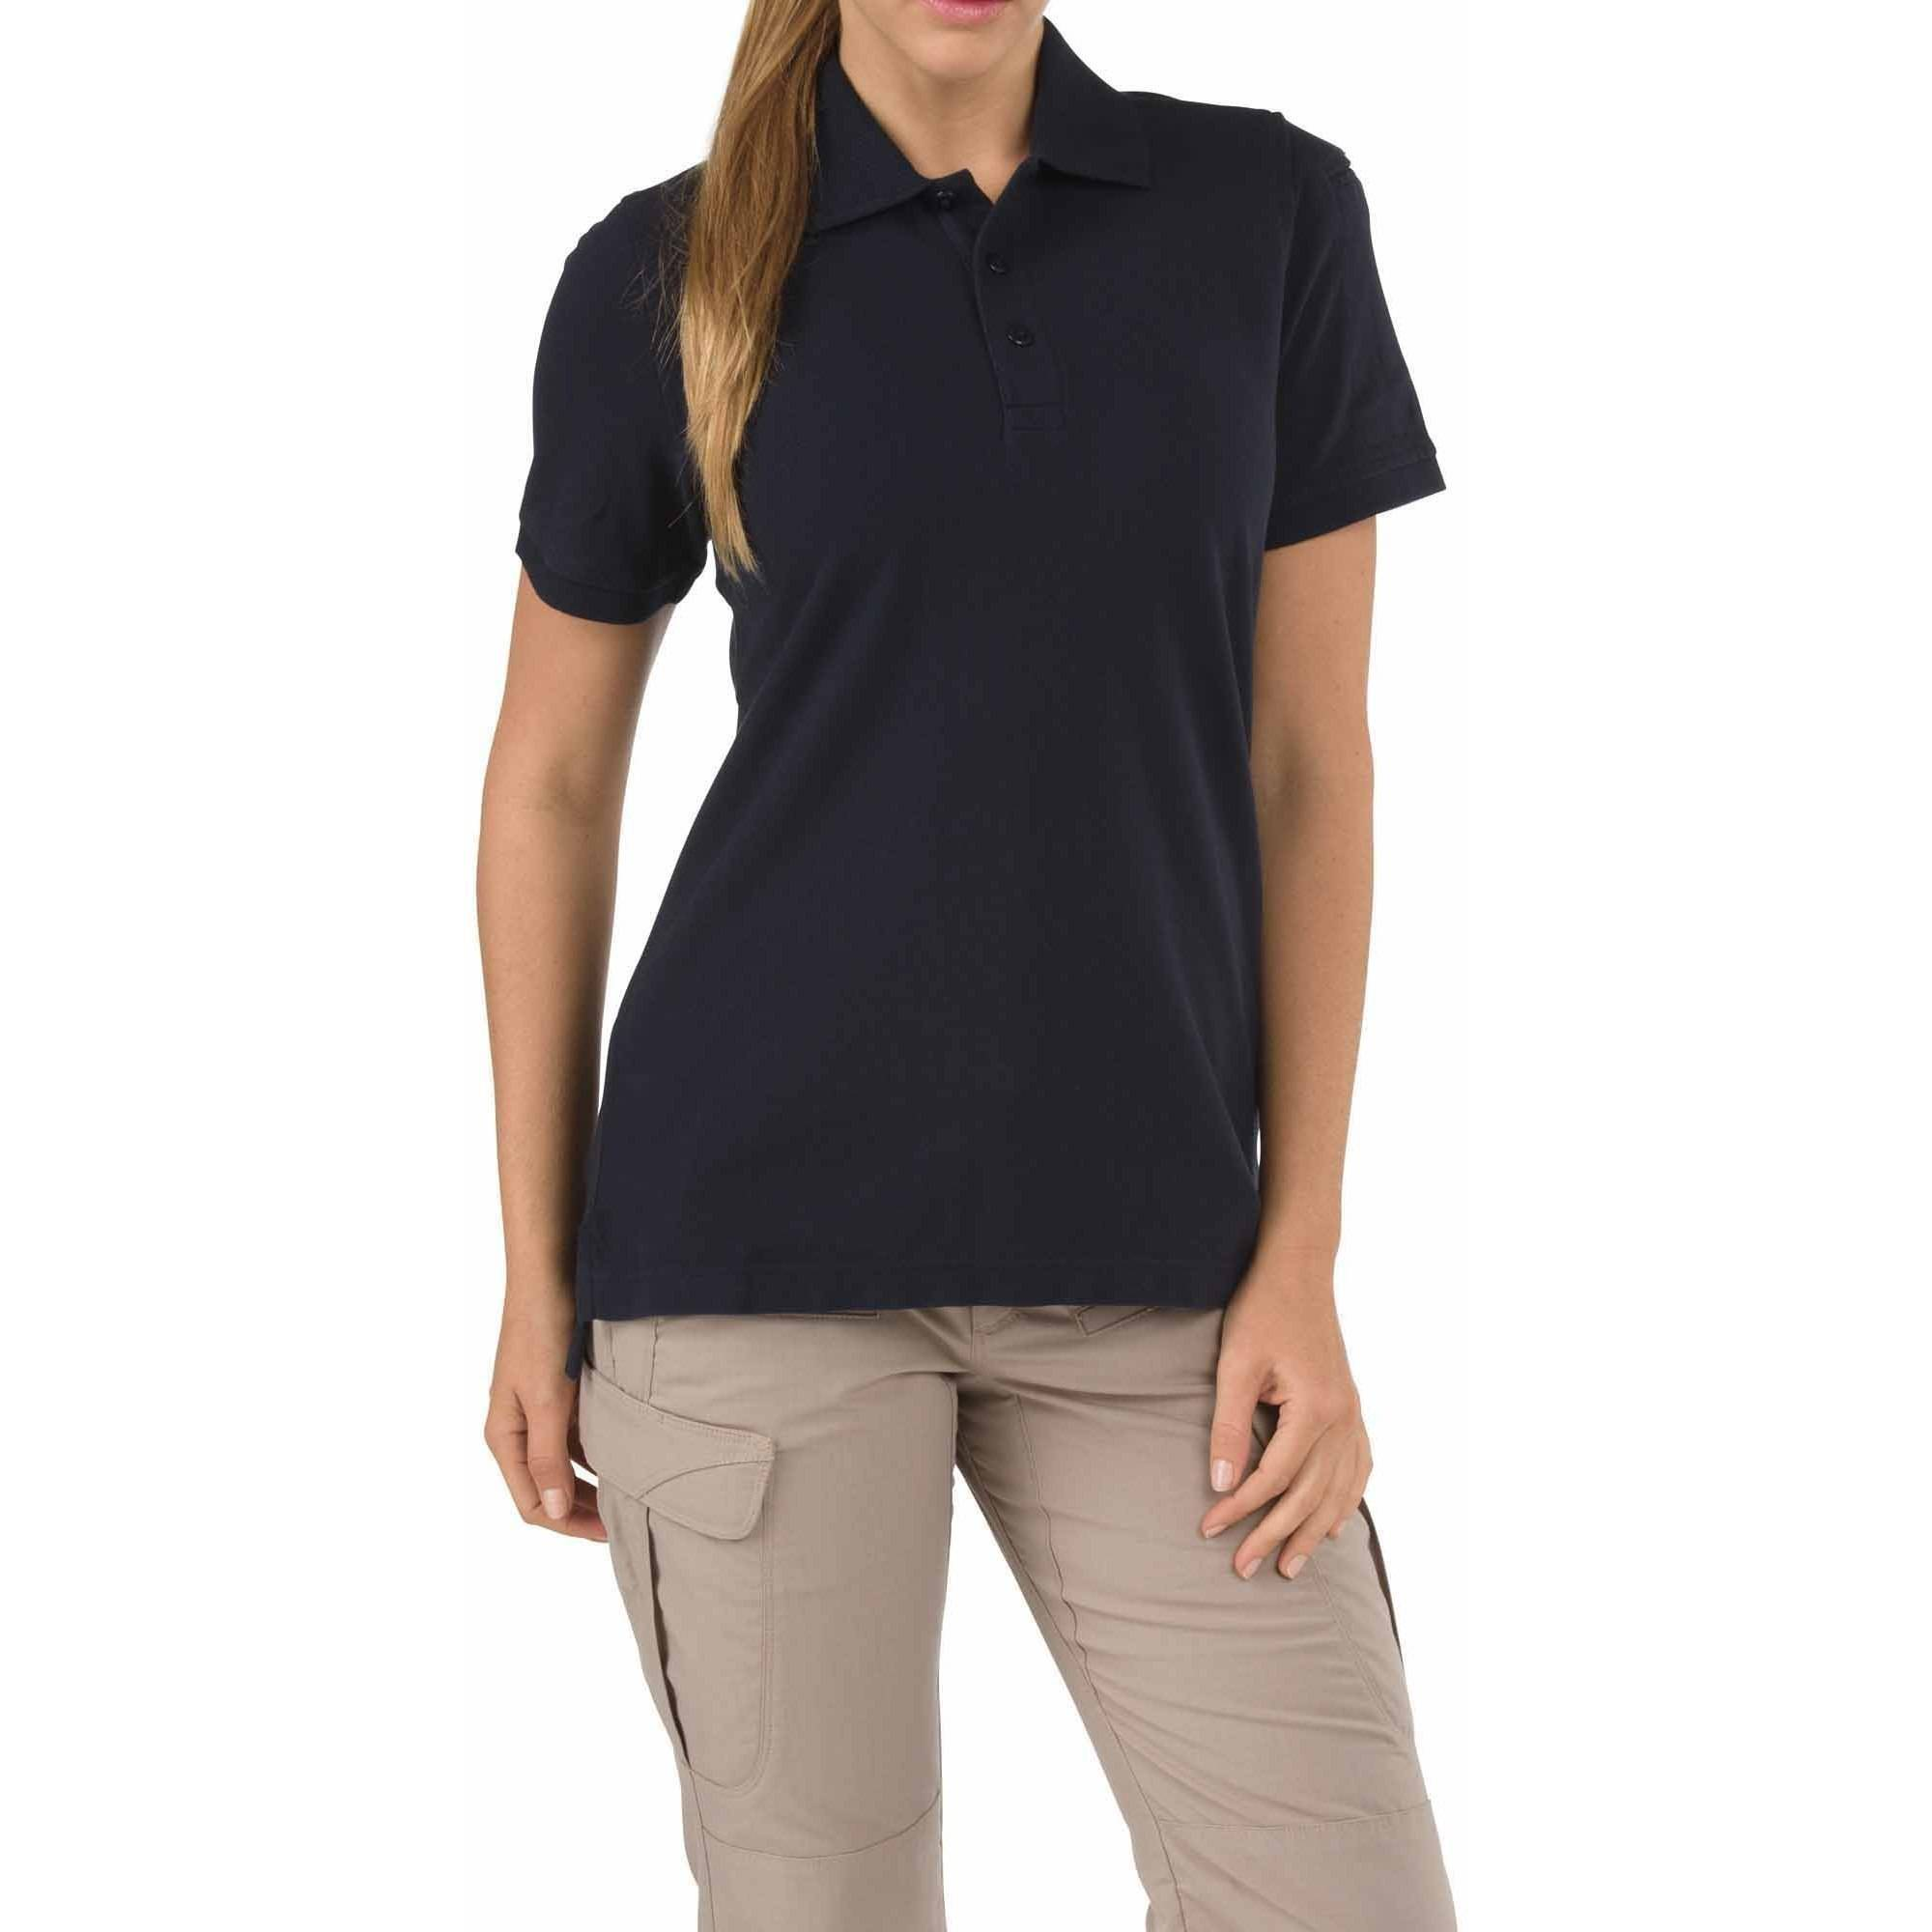 Women's Professional Polo Shirt, Dark Navy